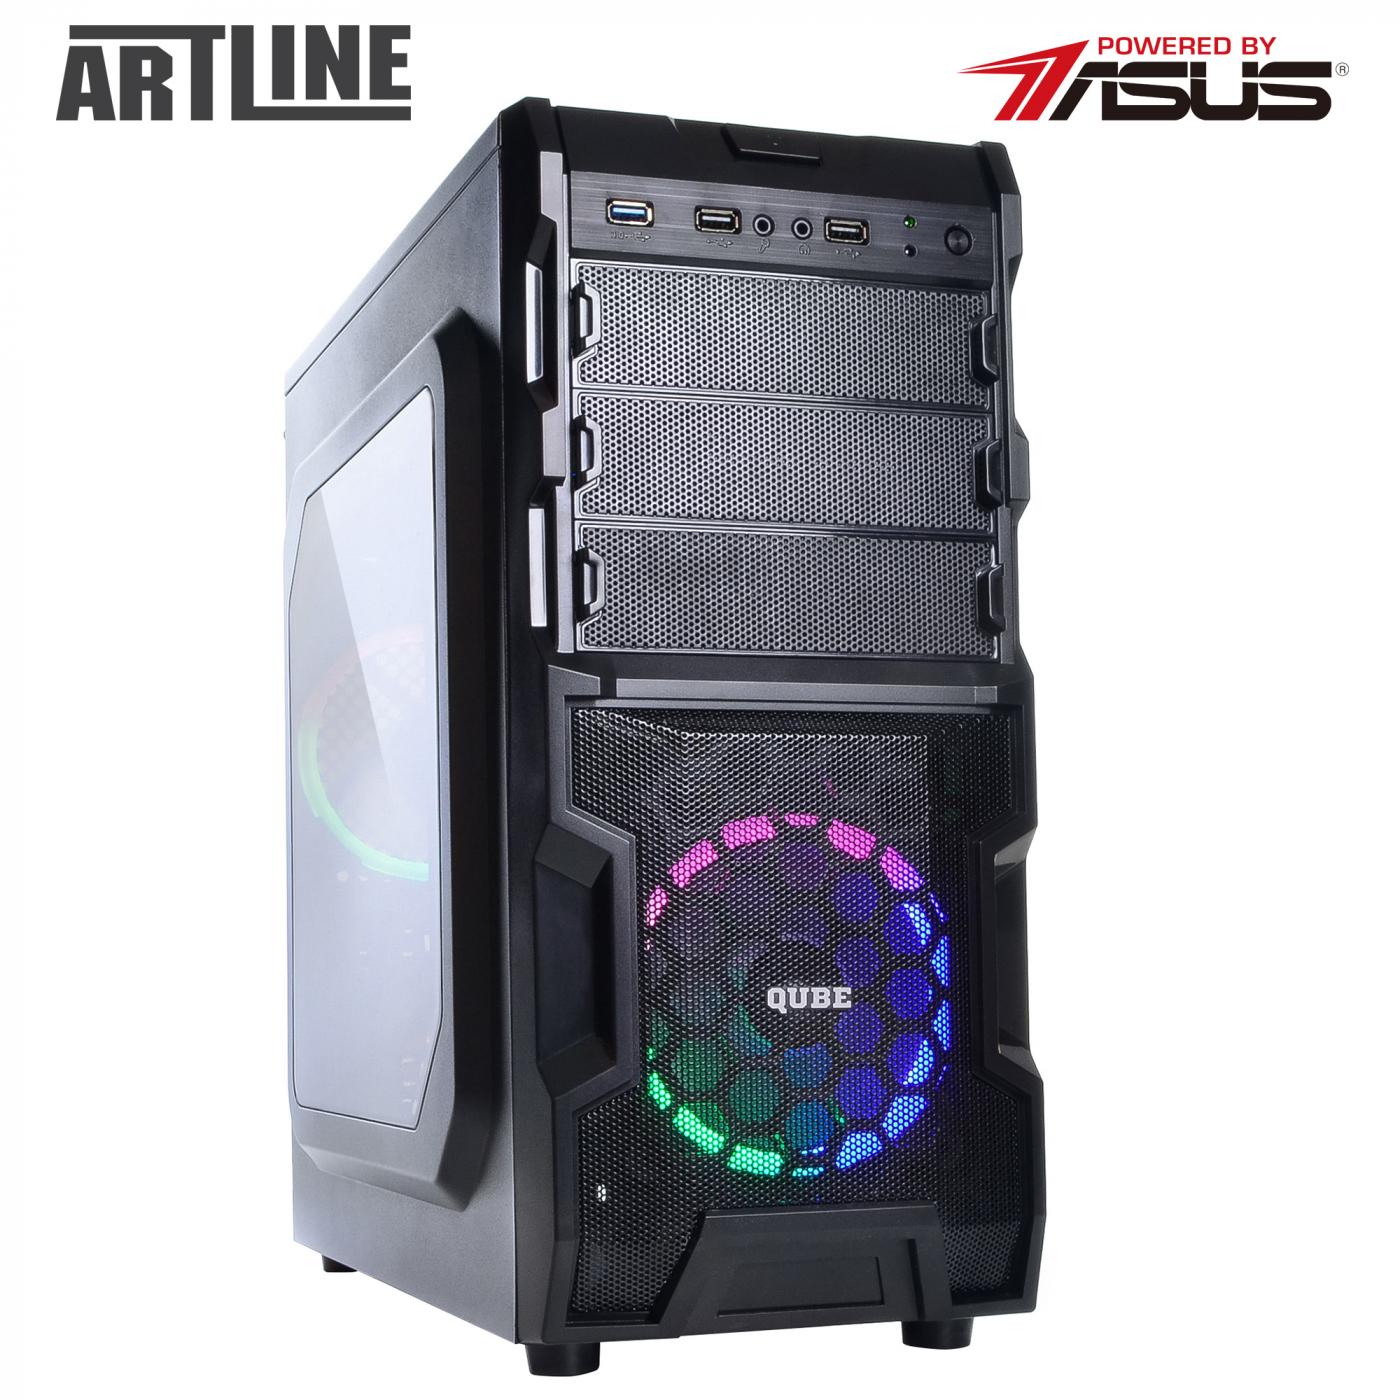 ARTLINE Gaming X38v15